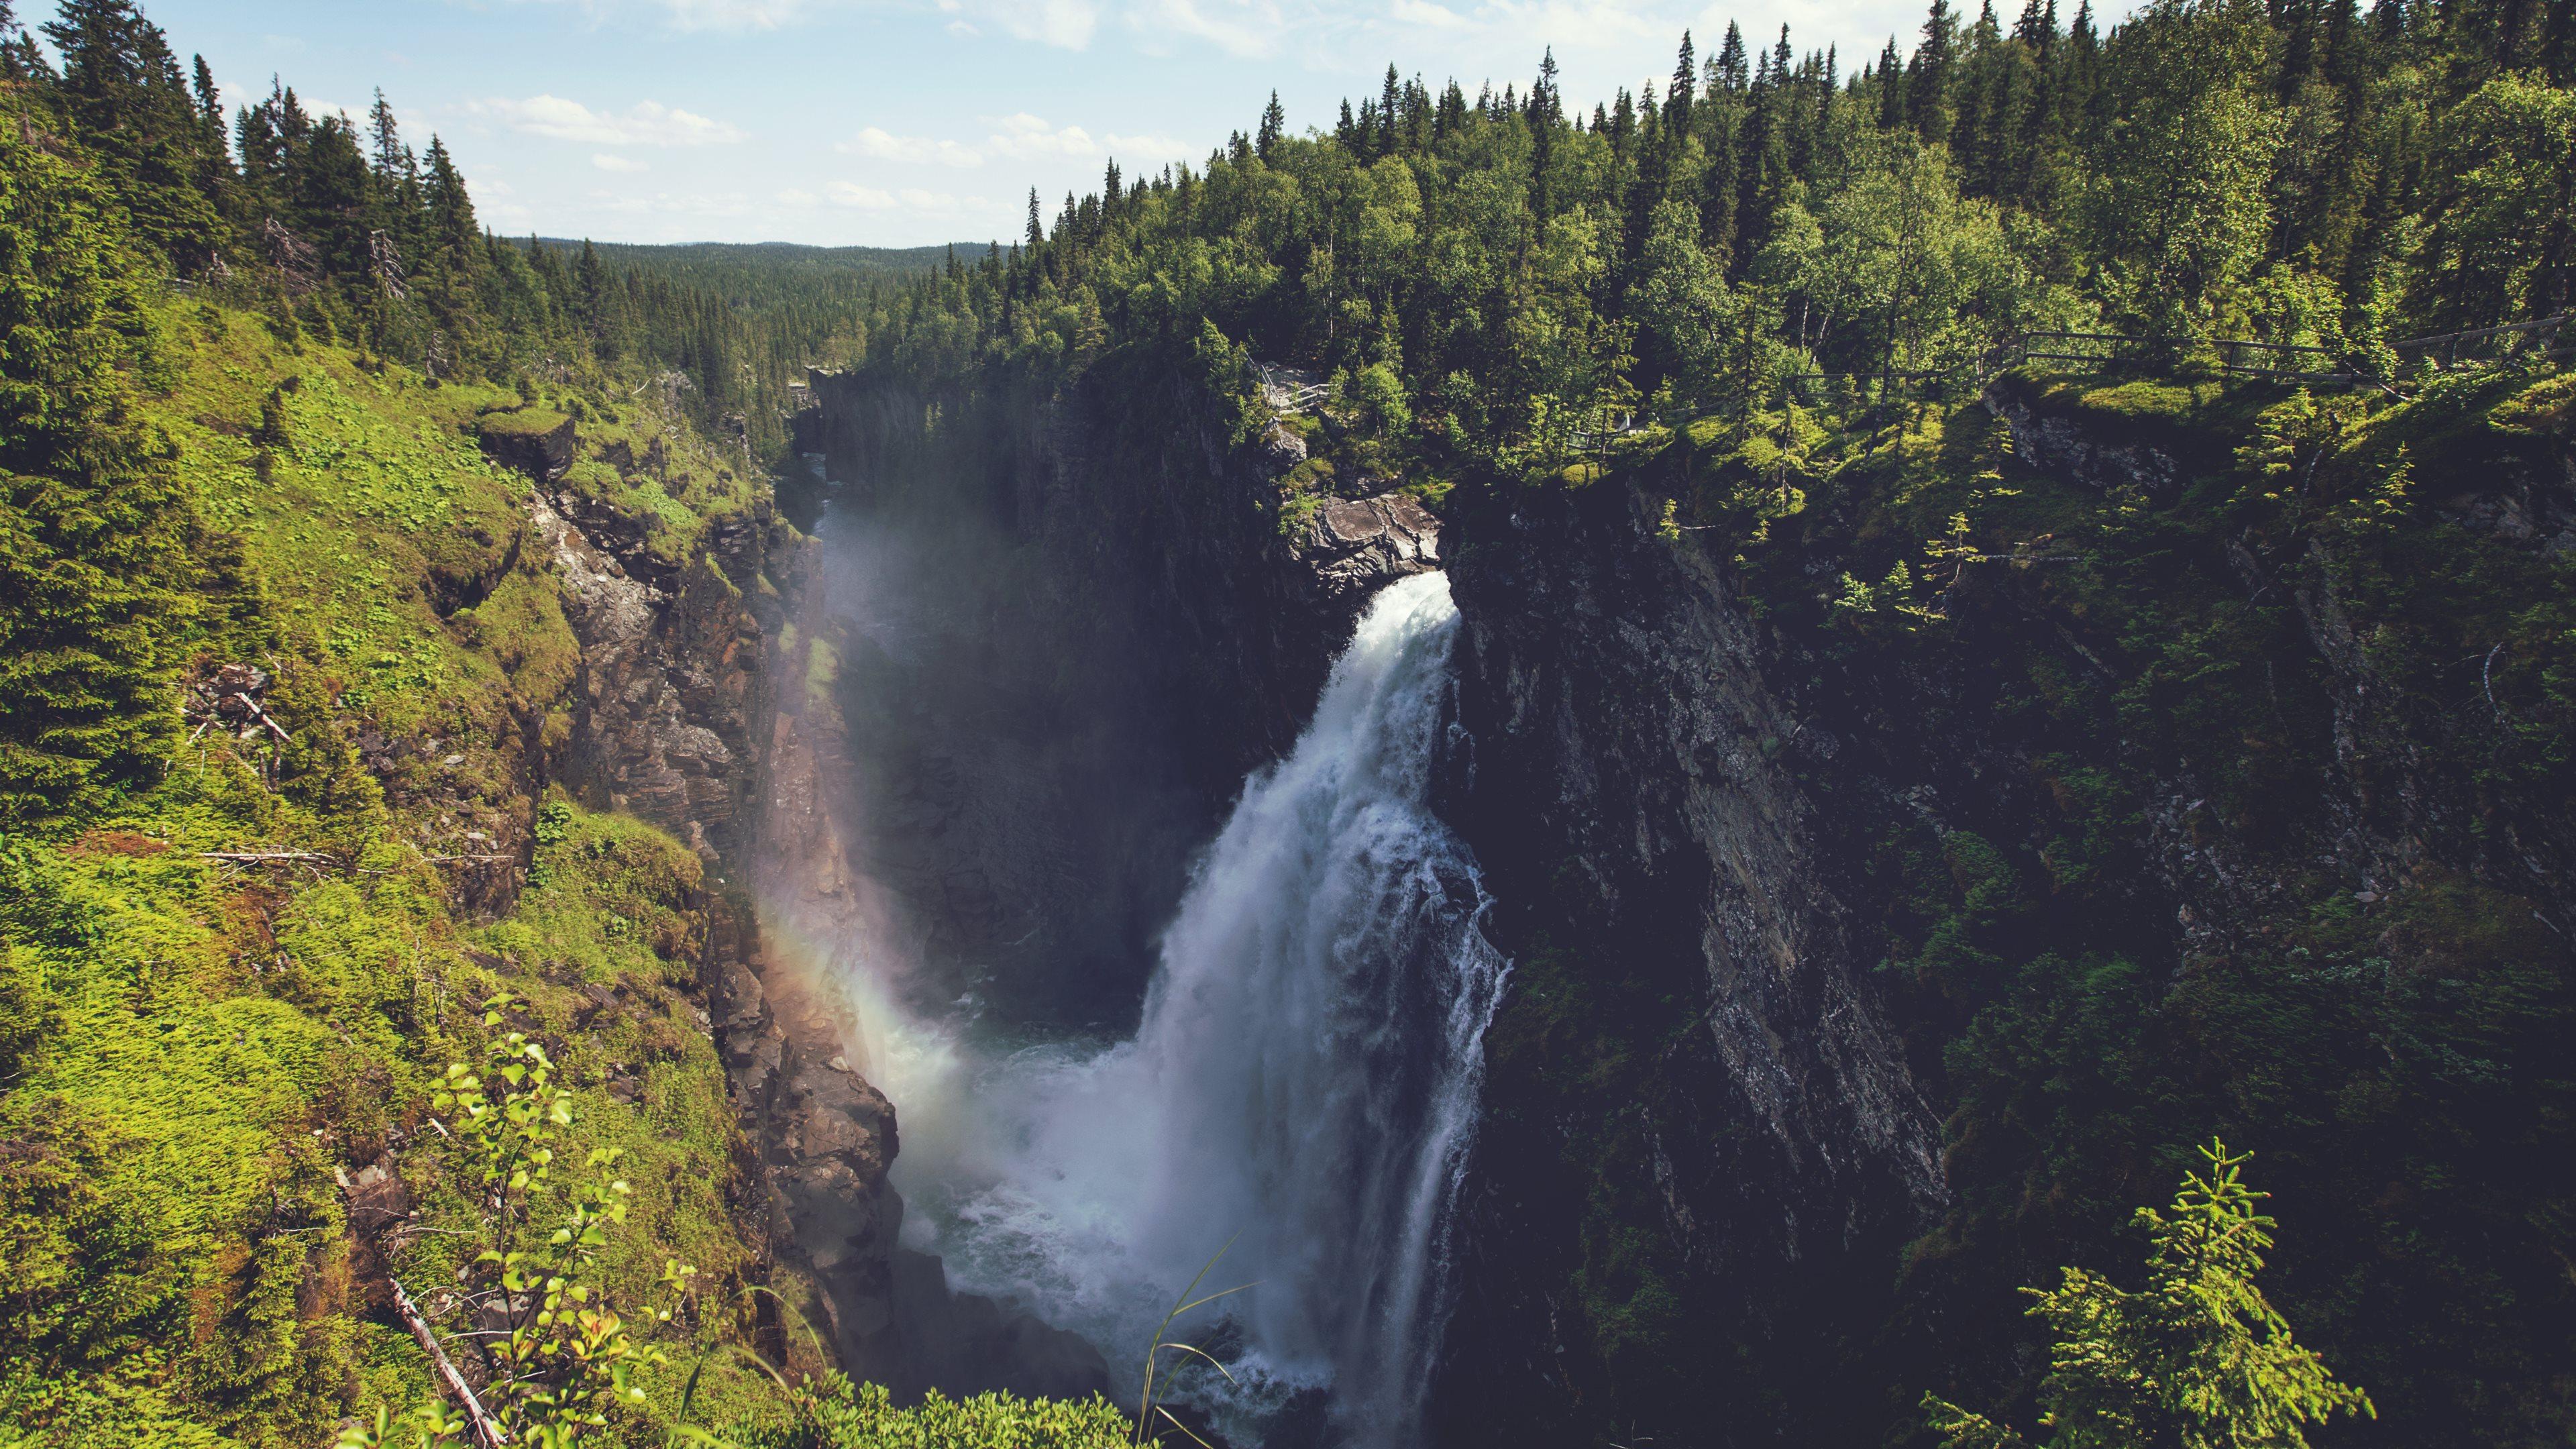 Download 3840x2160 Wallpaper Big Natural Waterfall, 4 K, Uhd